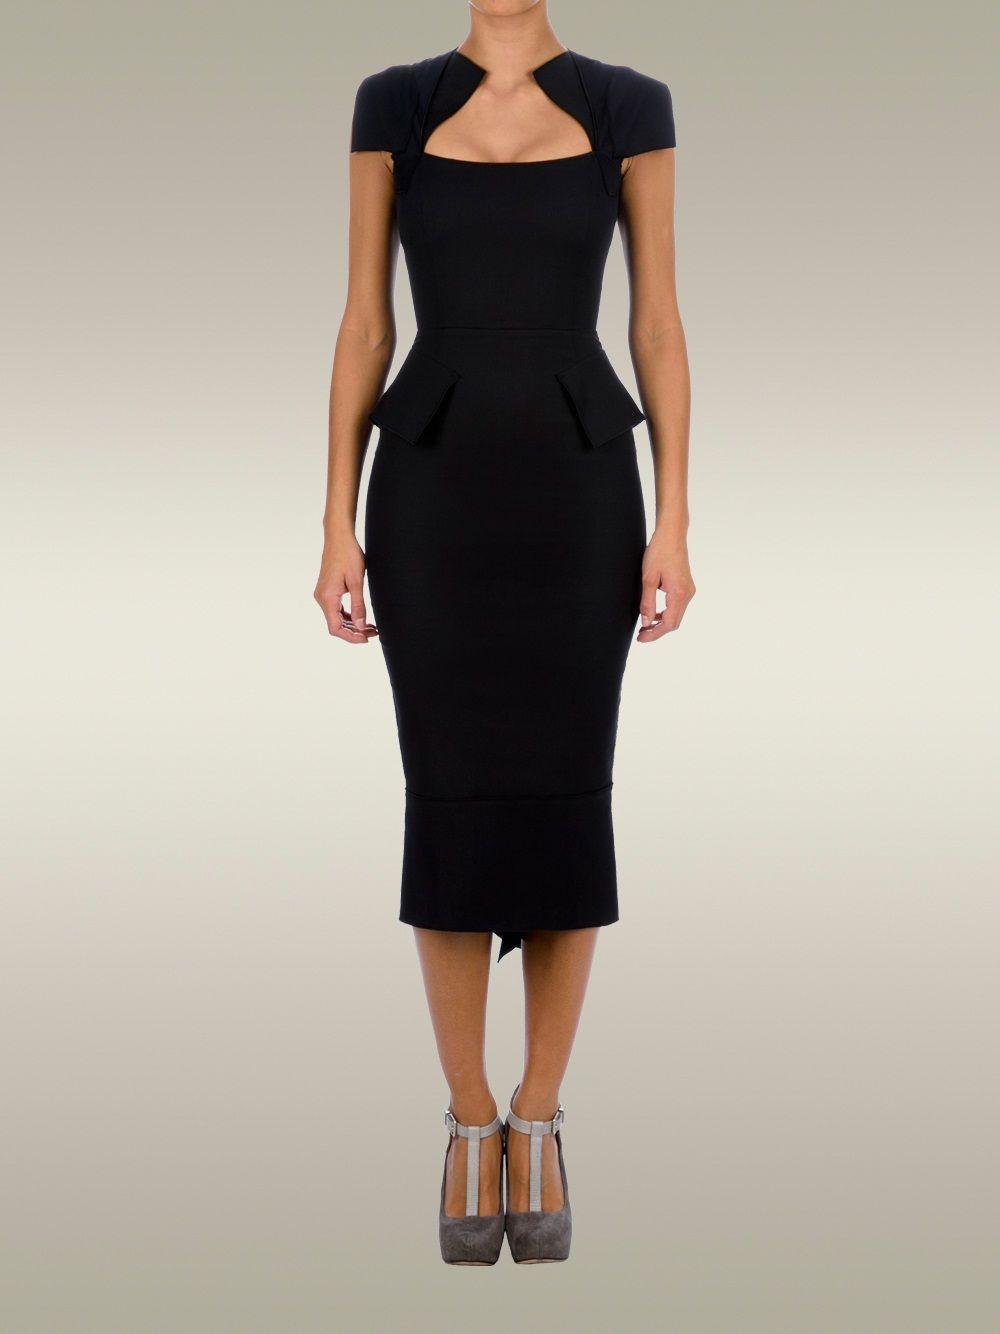 ae76f01dcb7 Women - Roland Mouret Titanium Dress - Roland Mouret